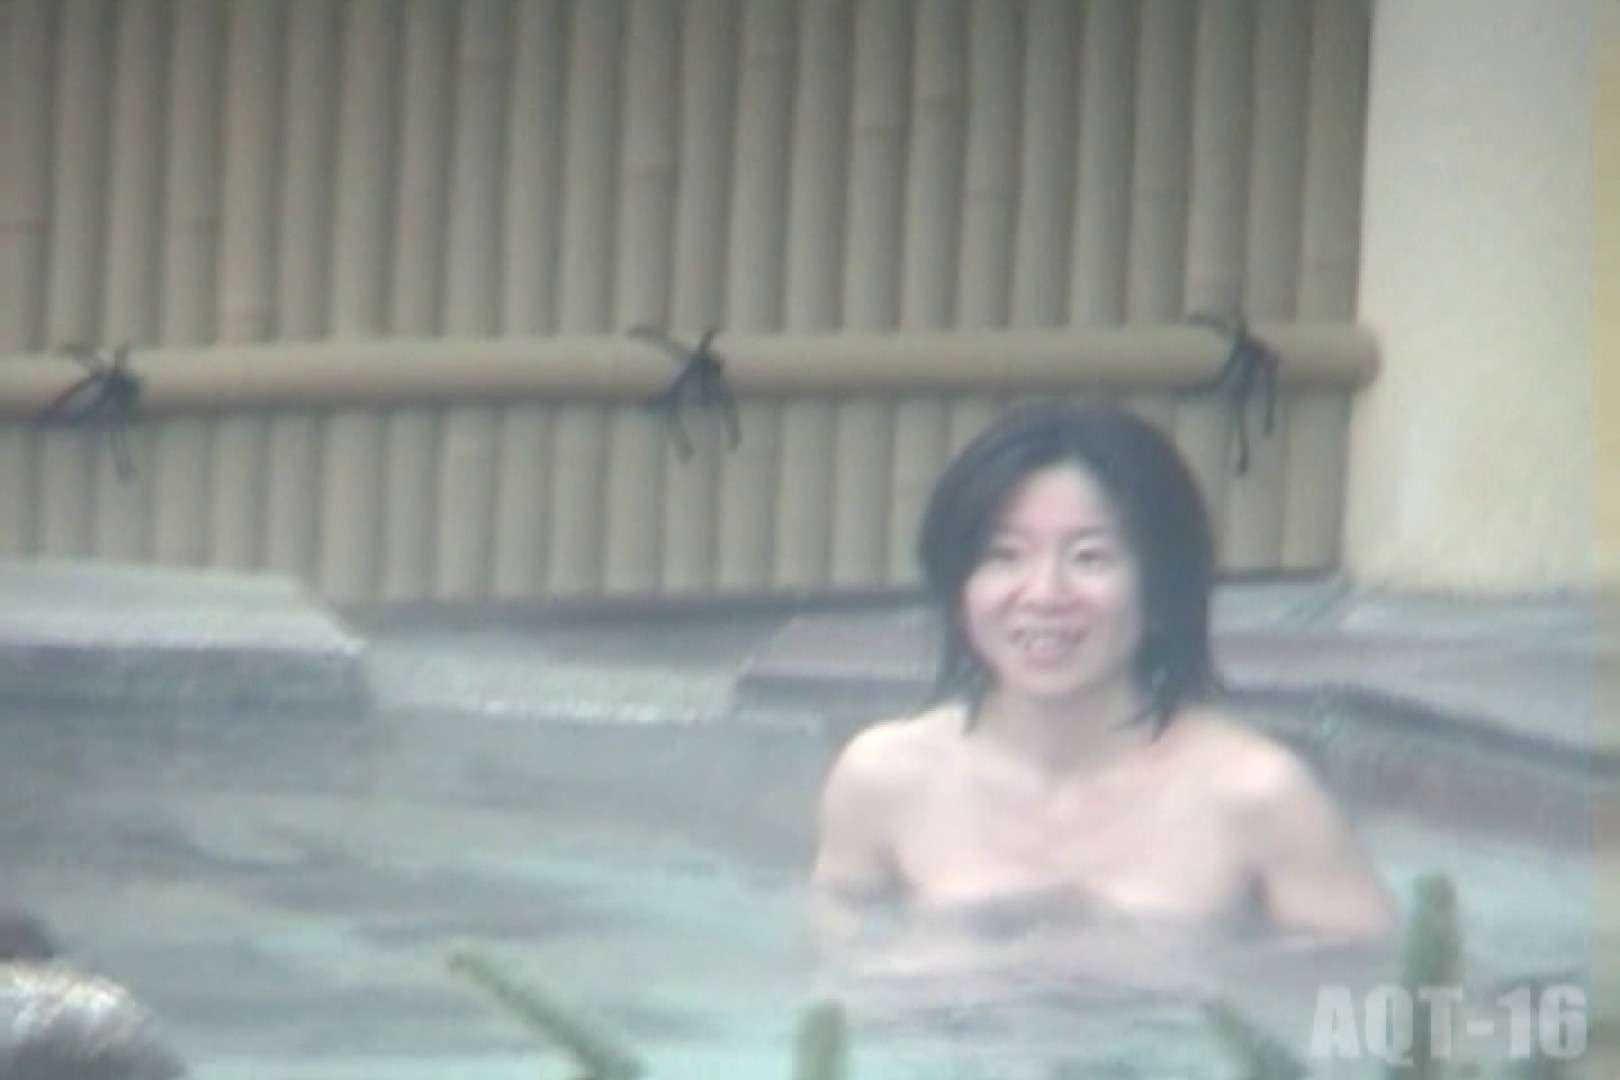 Aquaな露天風呂Vol.841 HなOL   盗撮  92pic 68